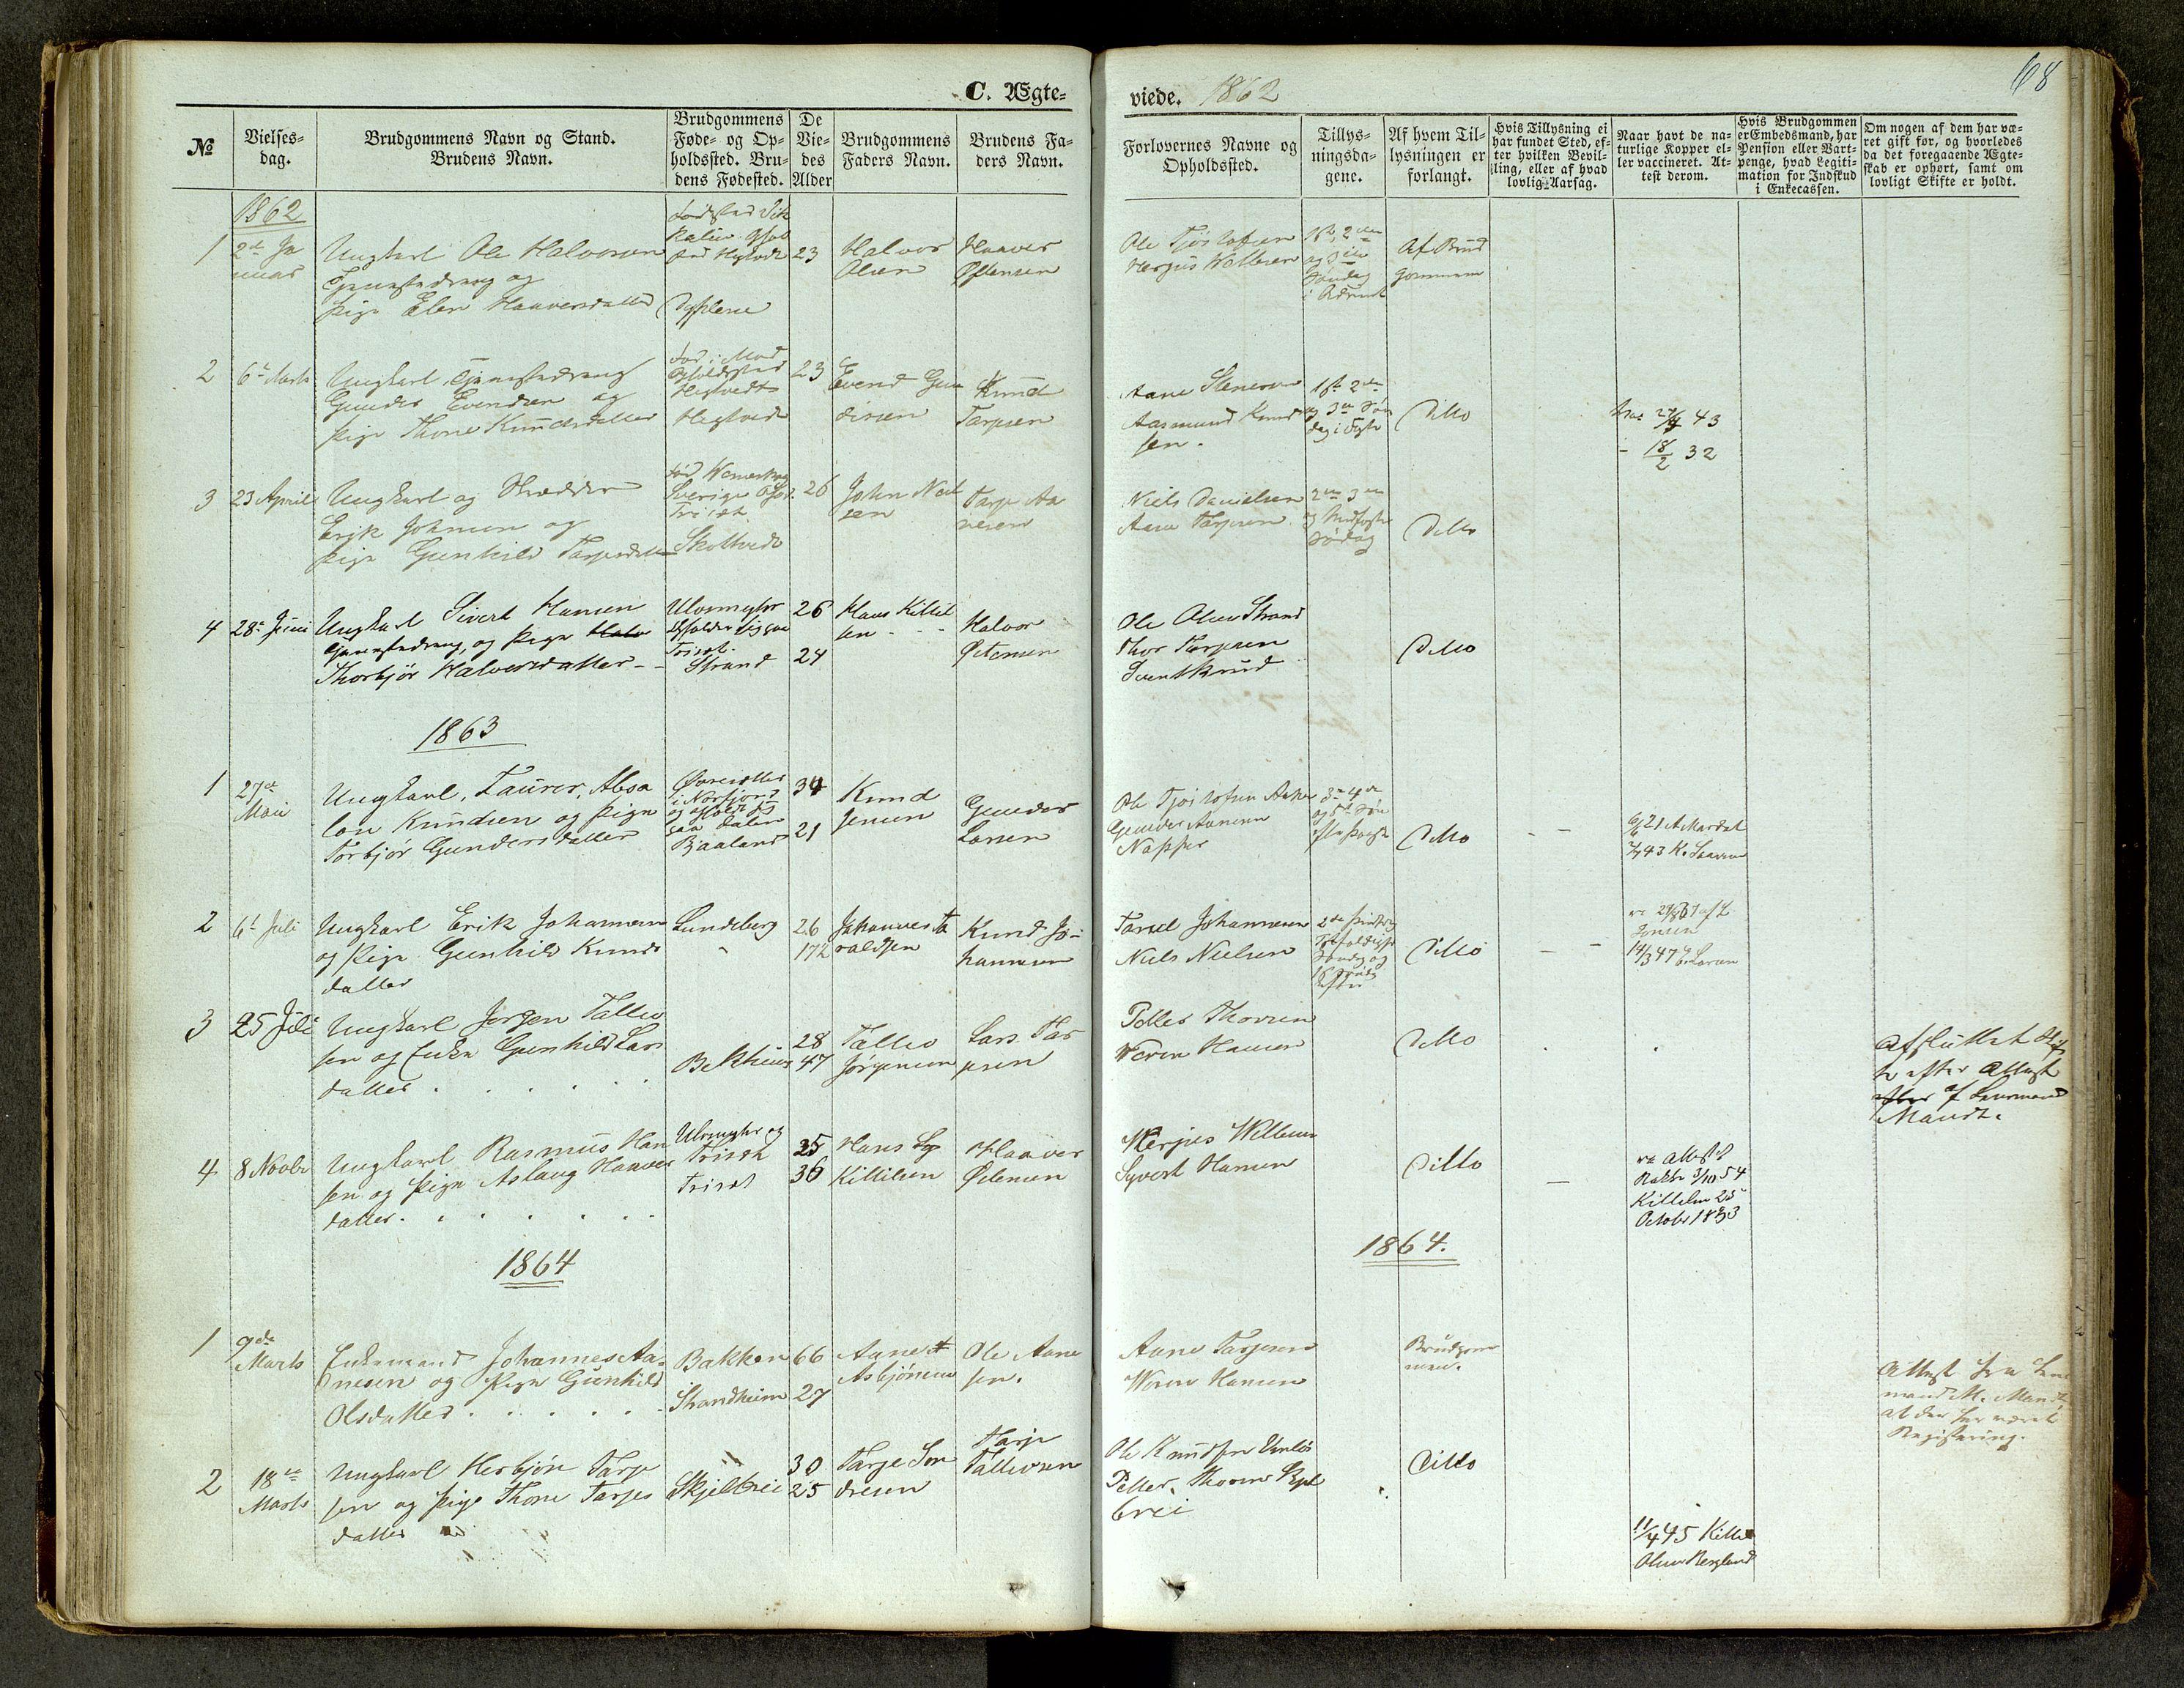 SAKO, Lårdal kirkebøker, G/Ga/L0002: Klokkerbok nr. I 2, 1861-1890, s. 68